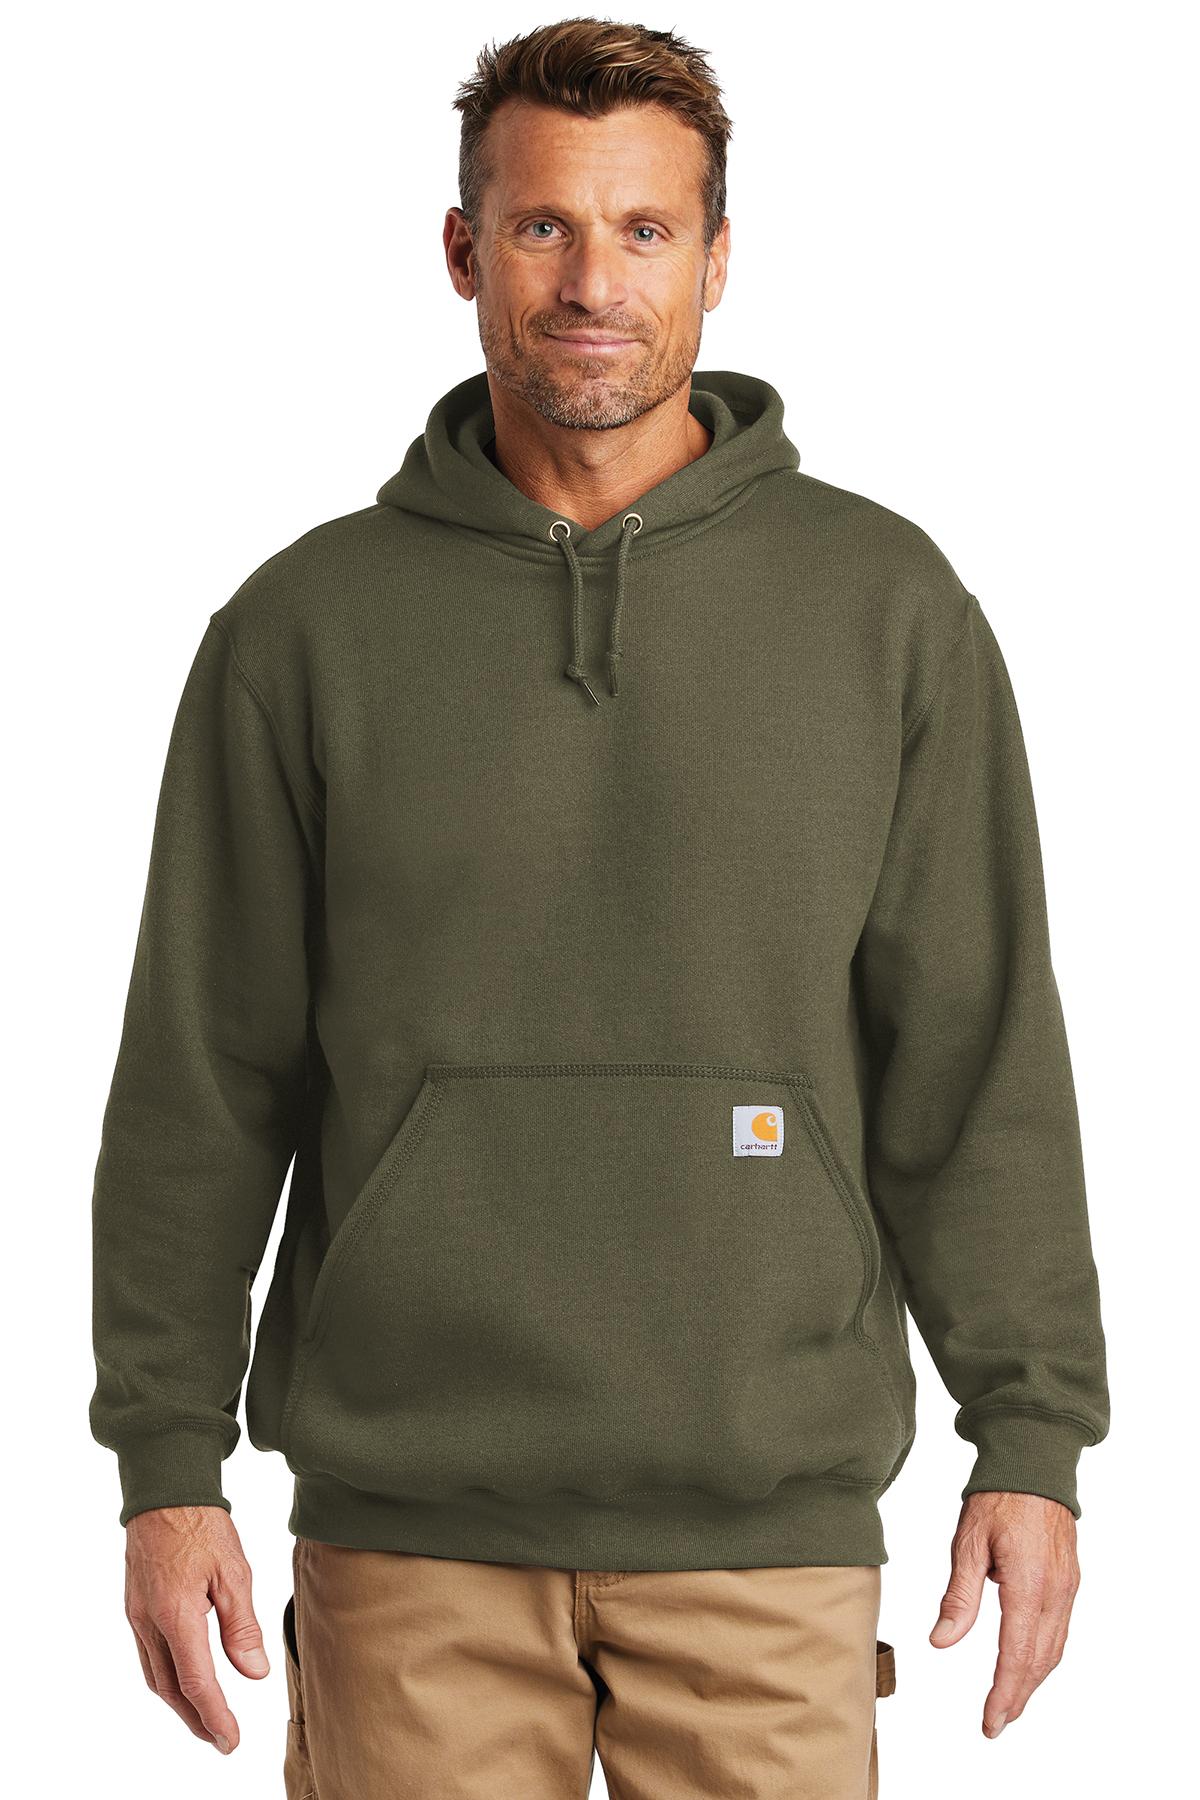 Carhartt CTK121 - Midweight Hooded Sweatshirt